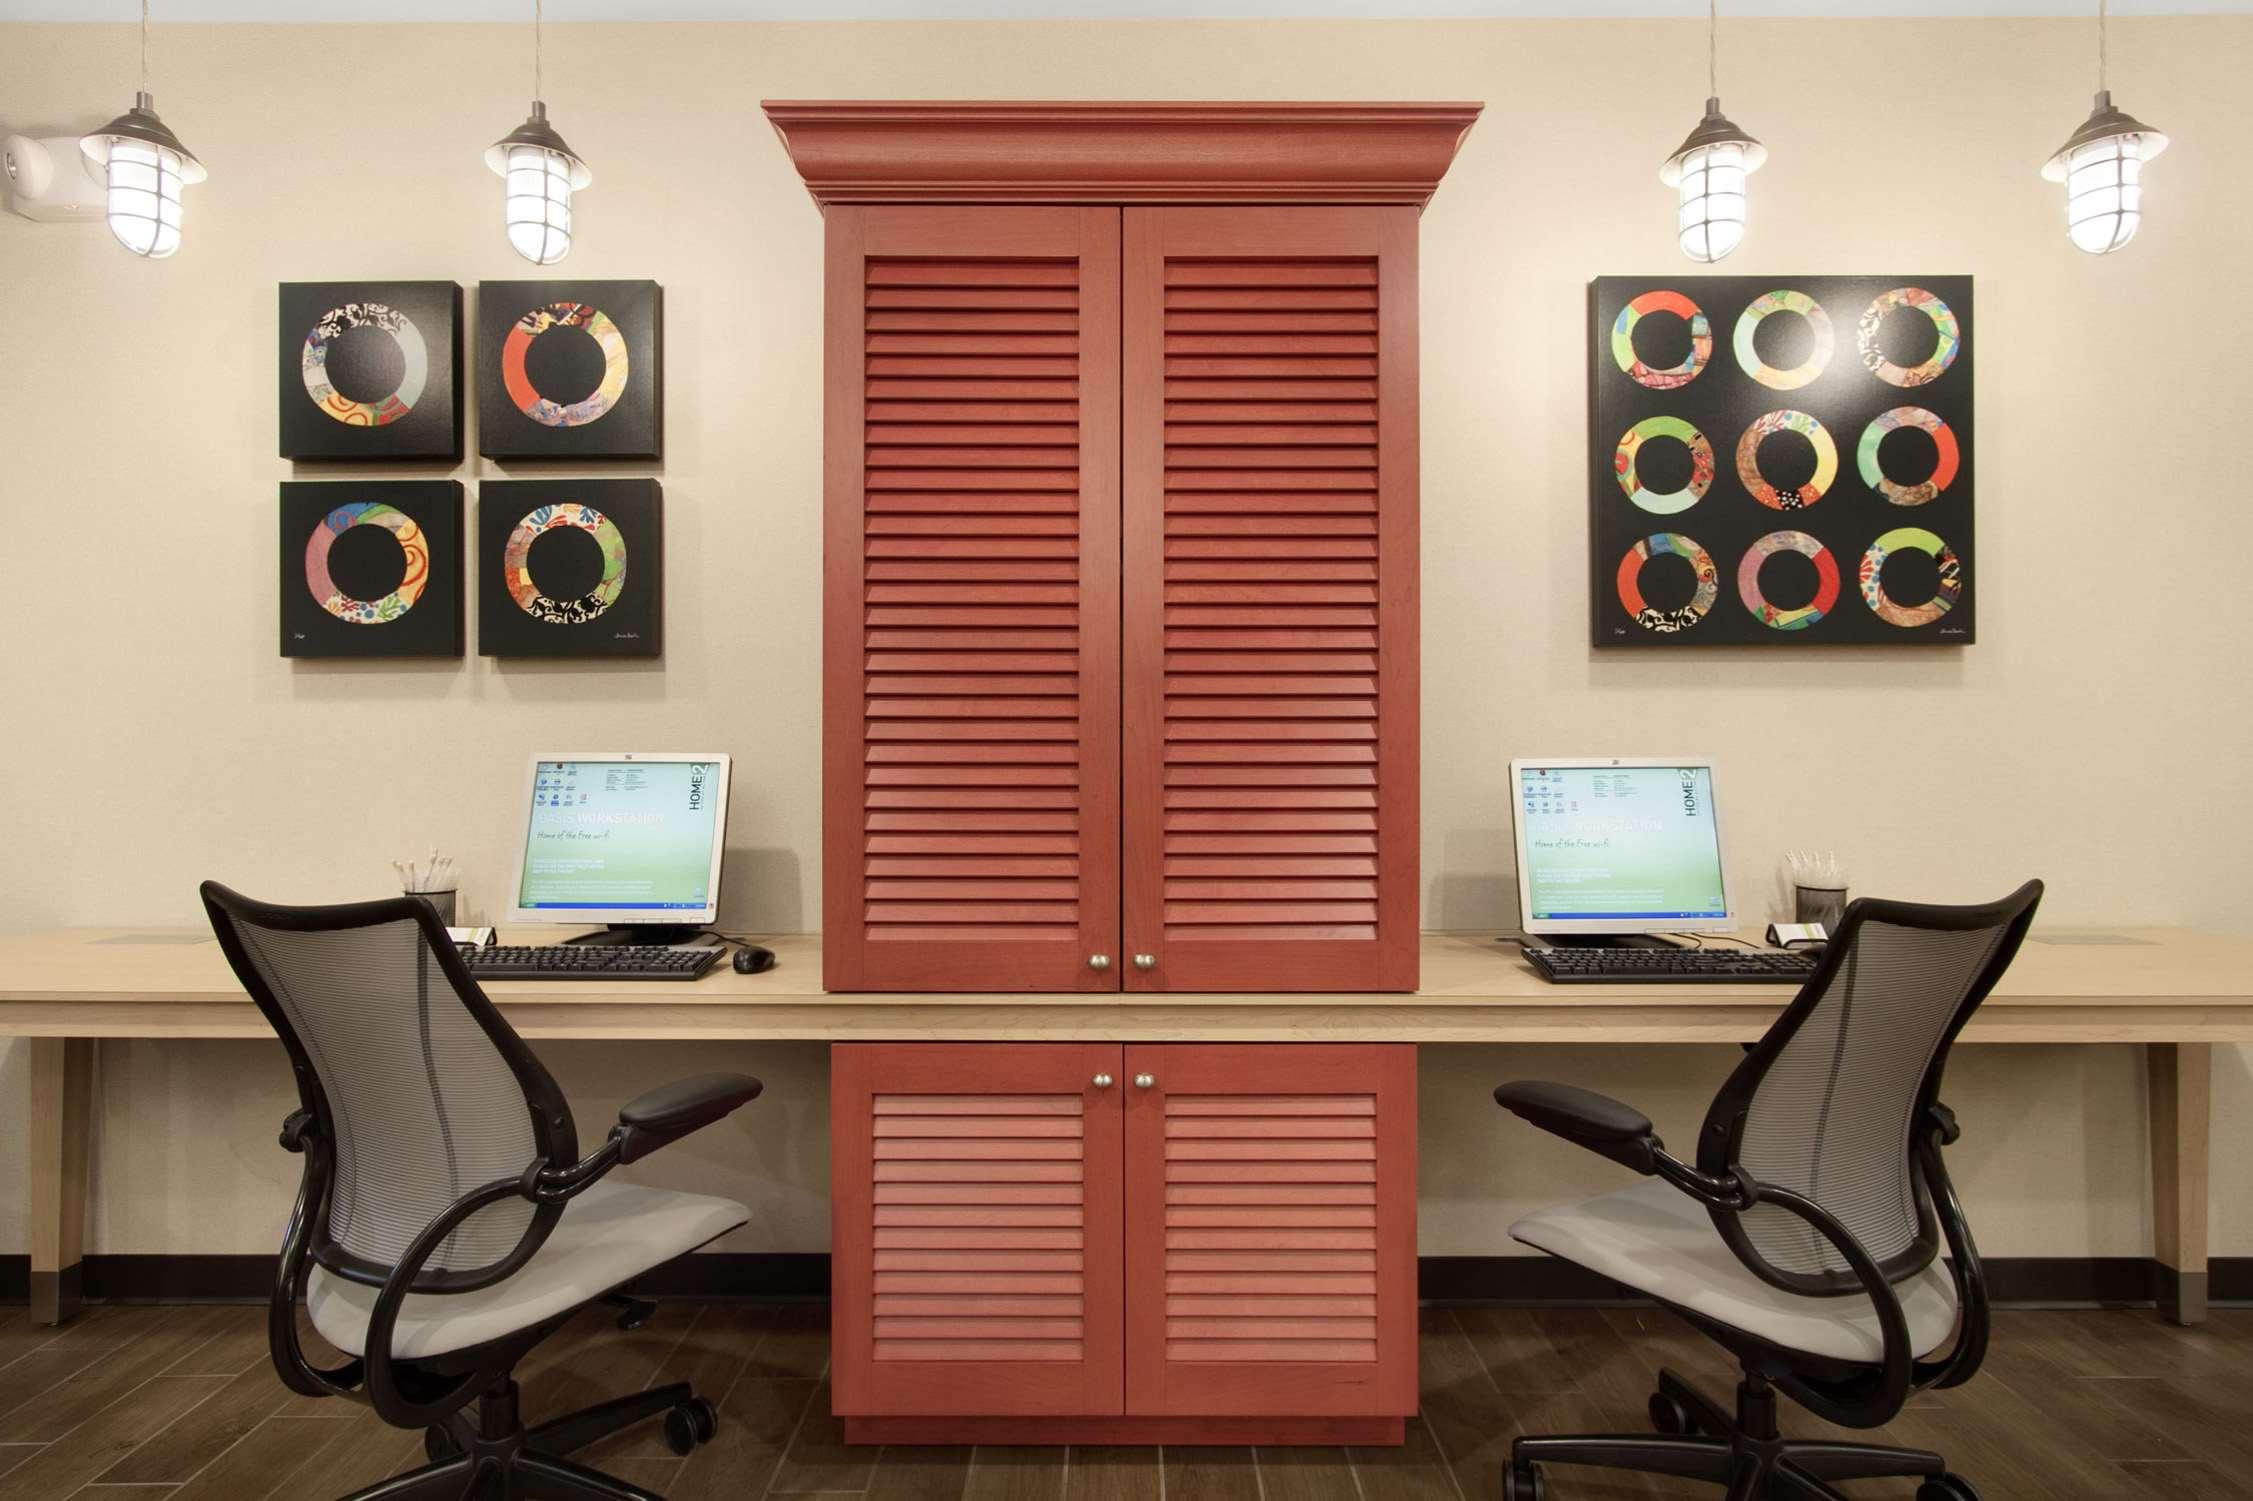 Home2 Suites by Hilton Fayetteville, NC image 14